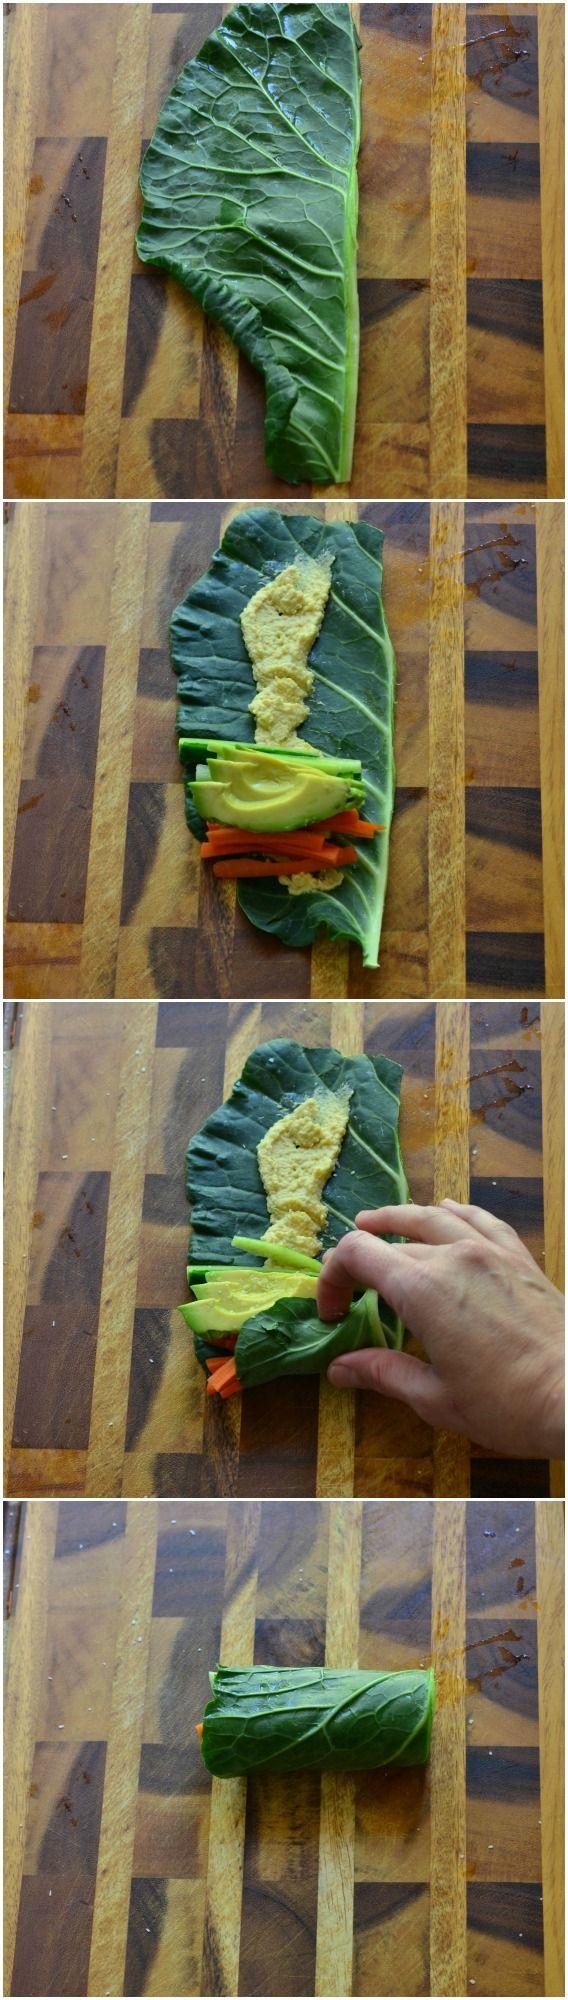 . #vegan #recipe #healthy #vegetarian #recipes